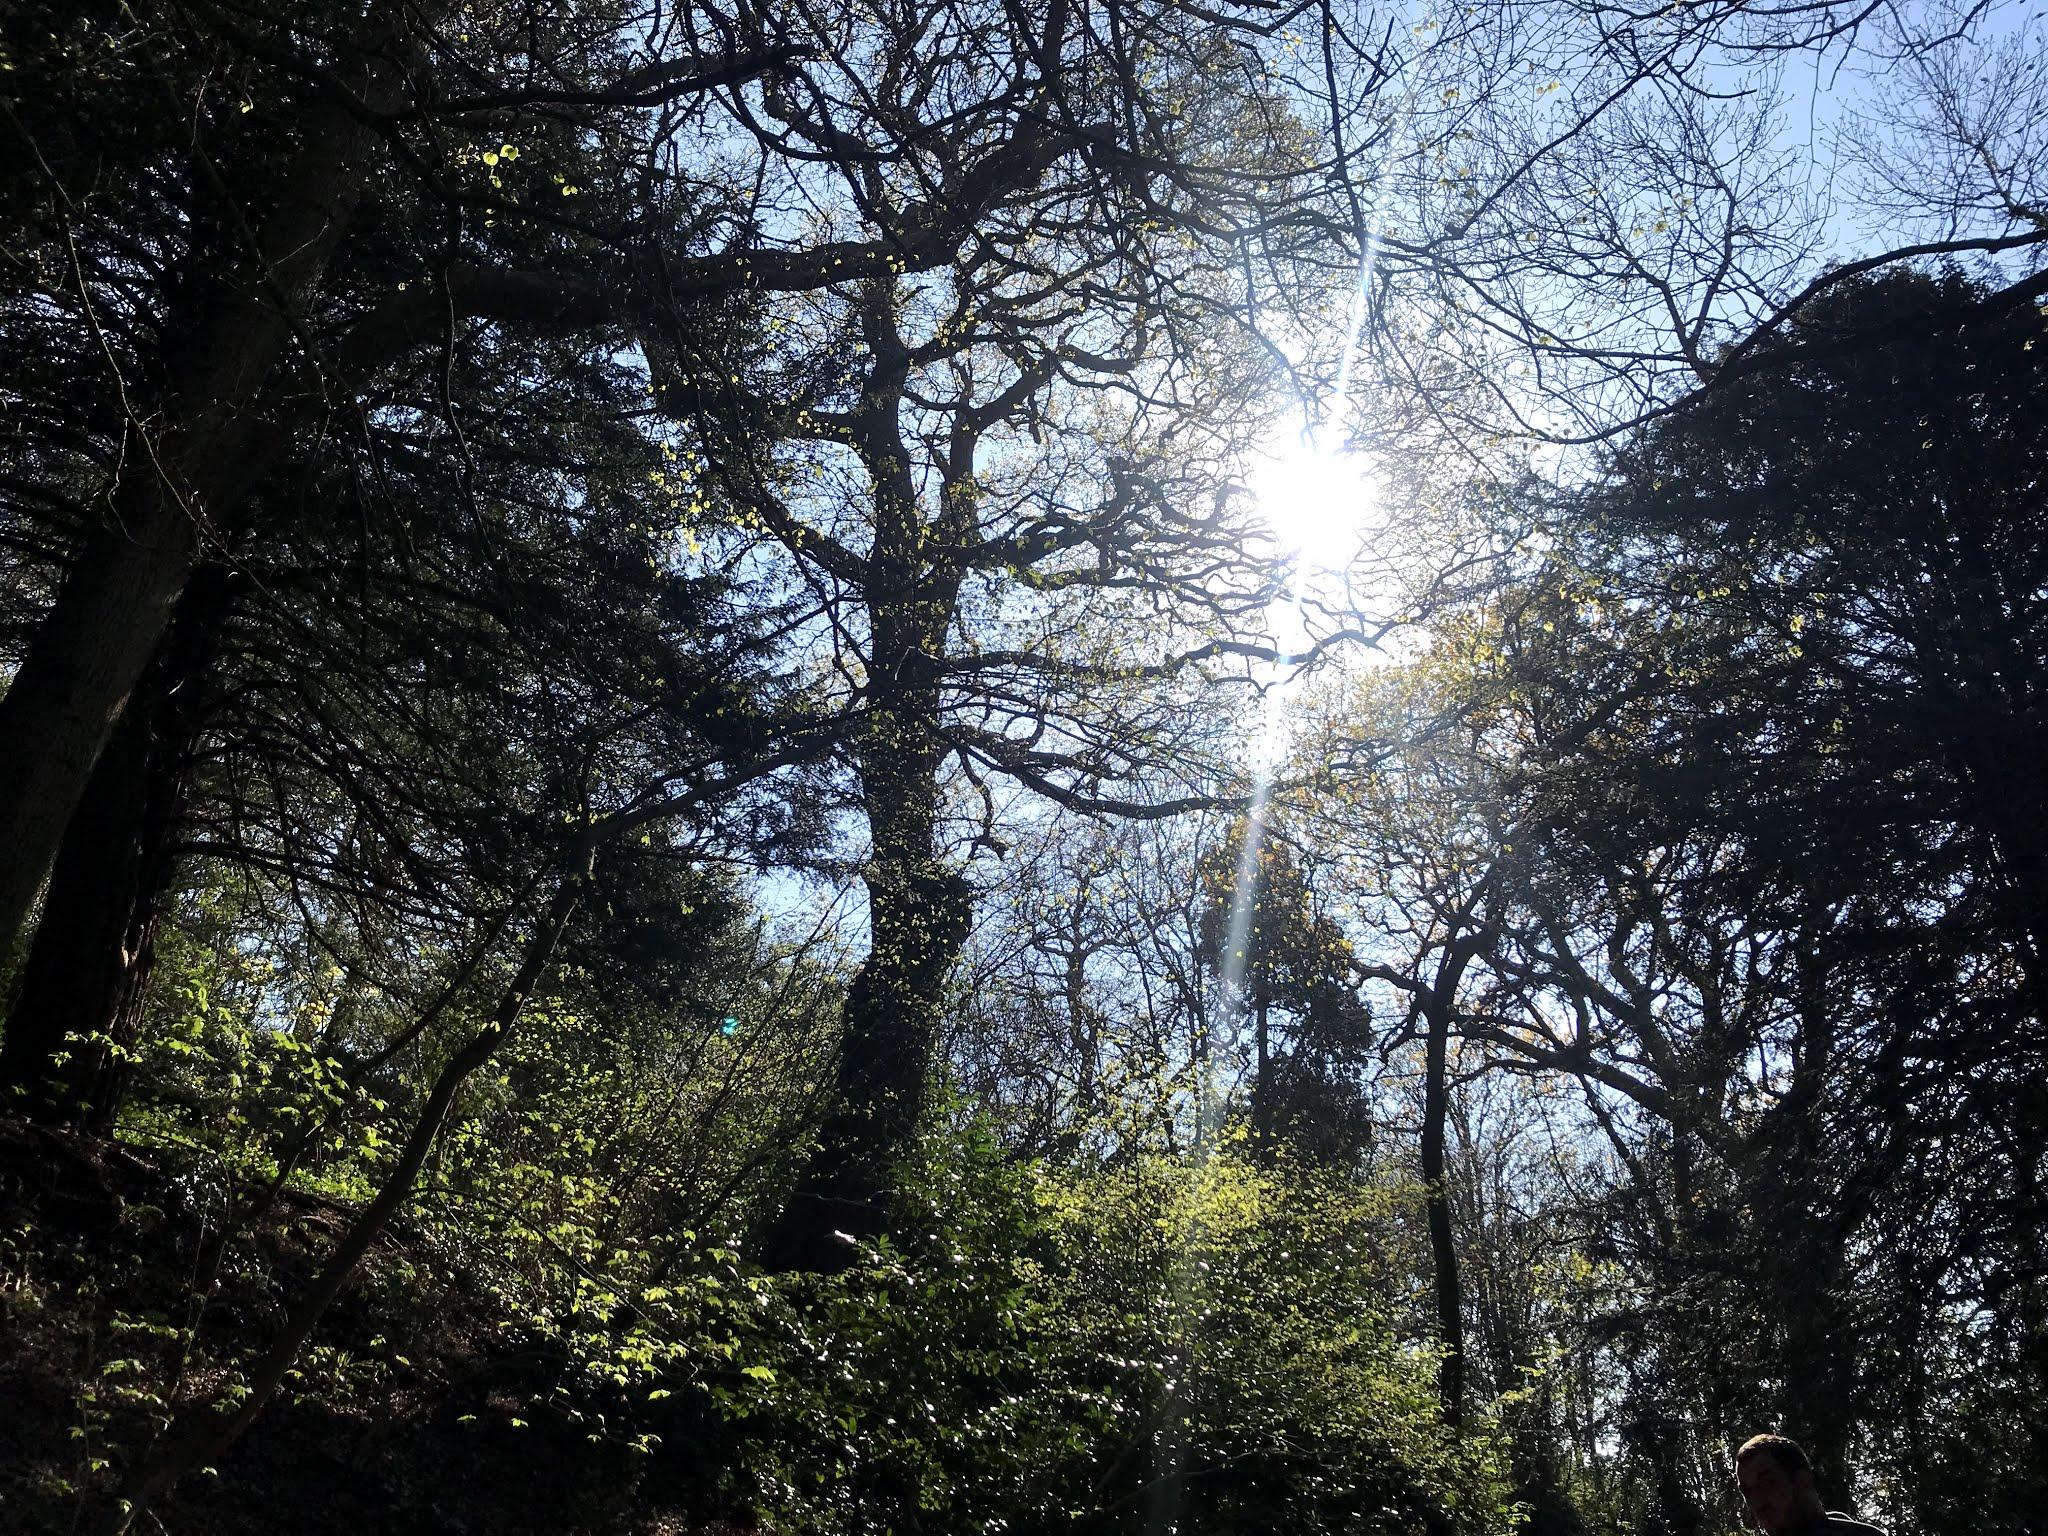 Sun shining through tree - blue skies. April round up blog post